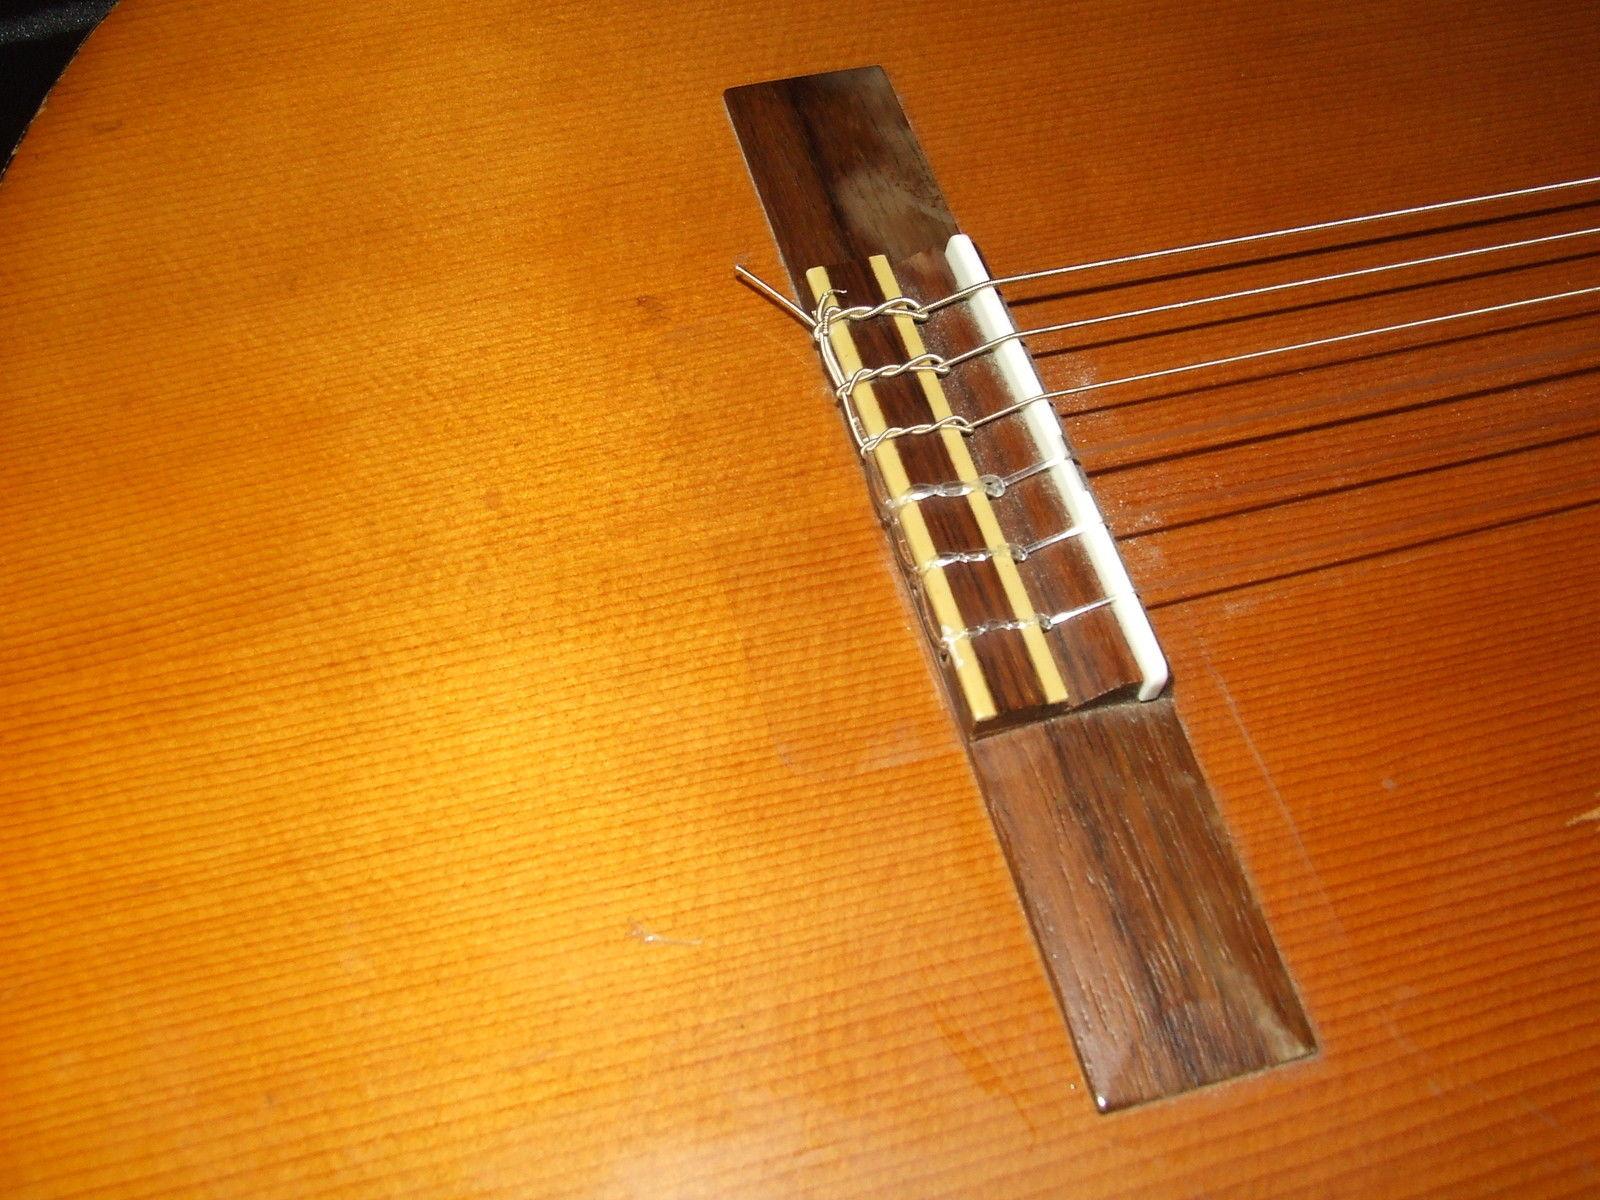 classical guitar soundboard protector. Black Bedroom Furniture Sets. Home Design Ideas